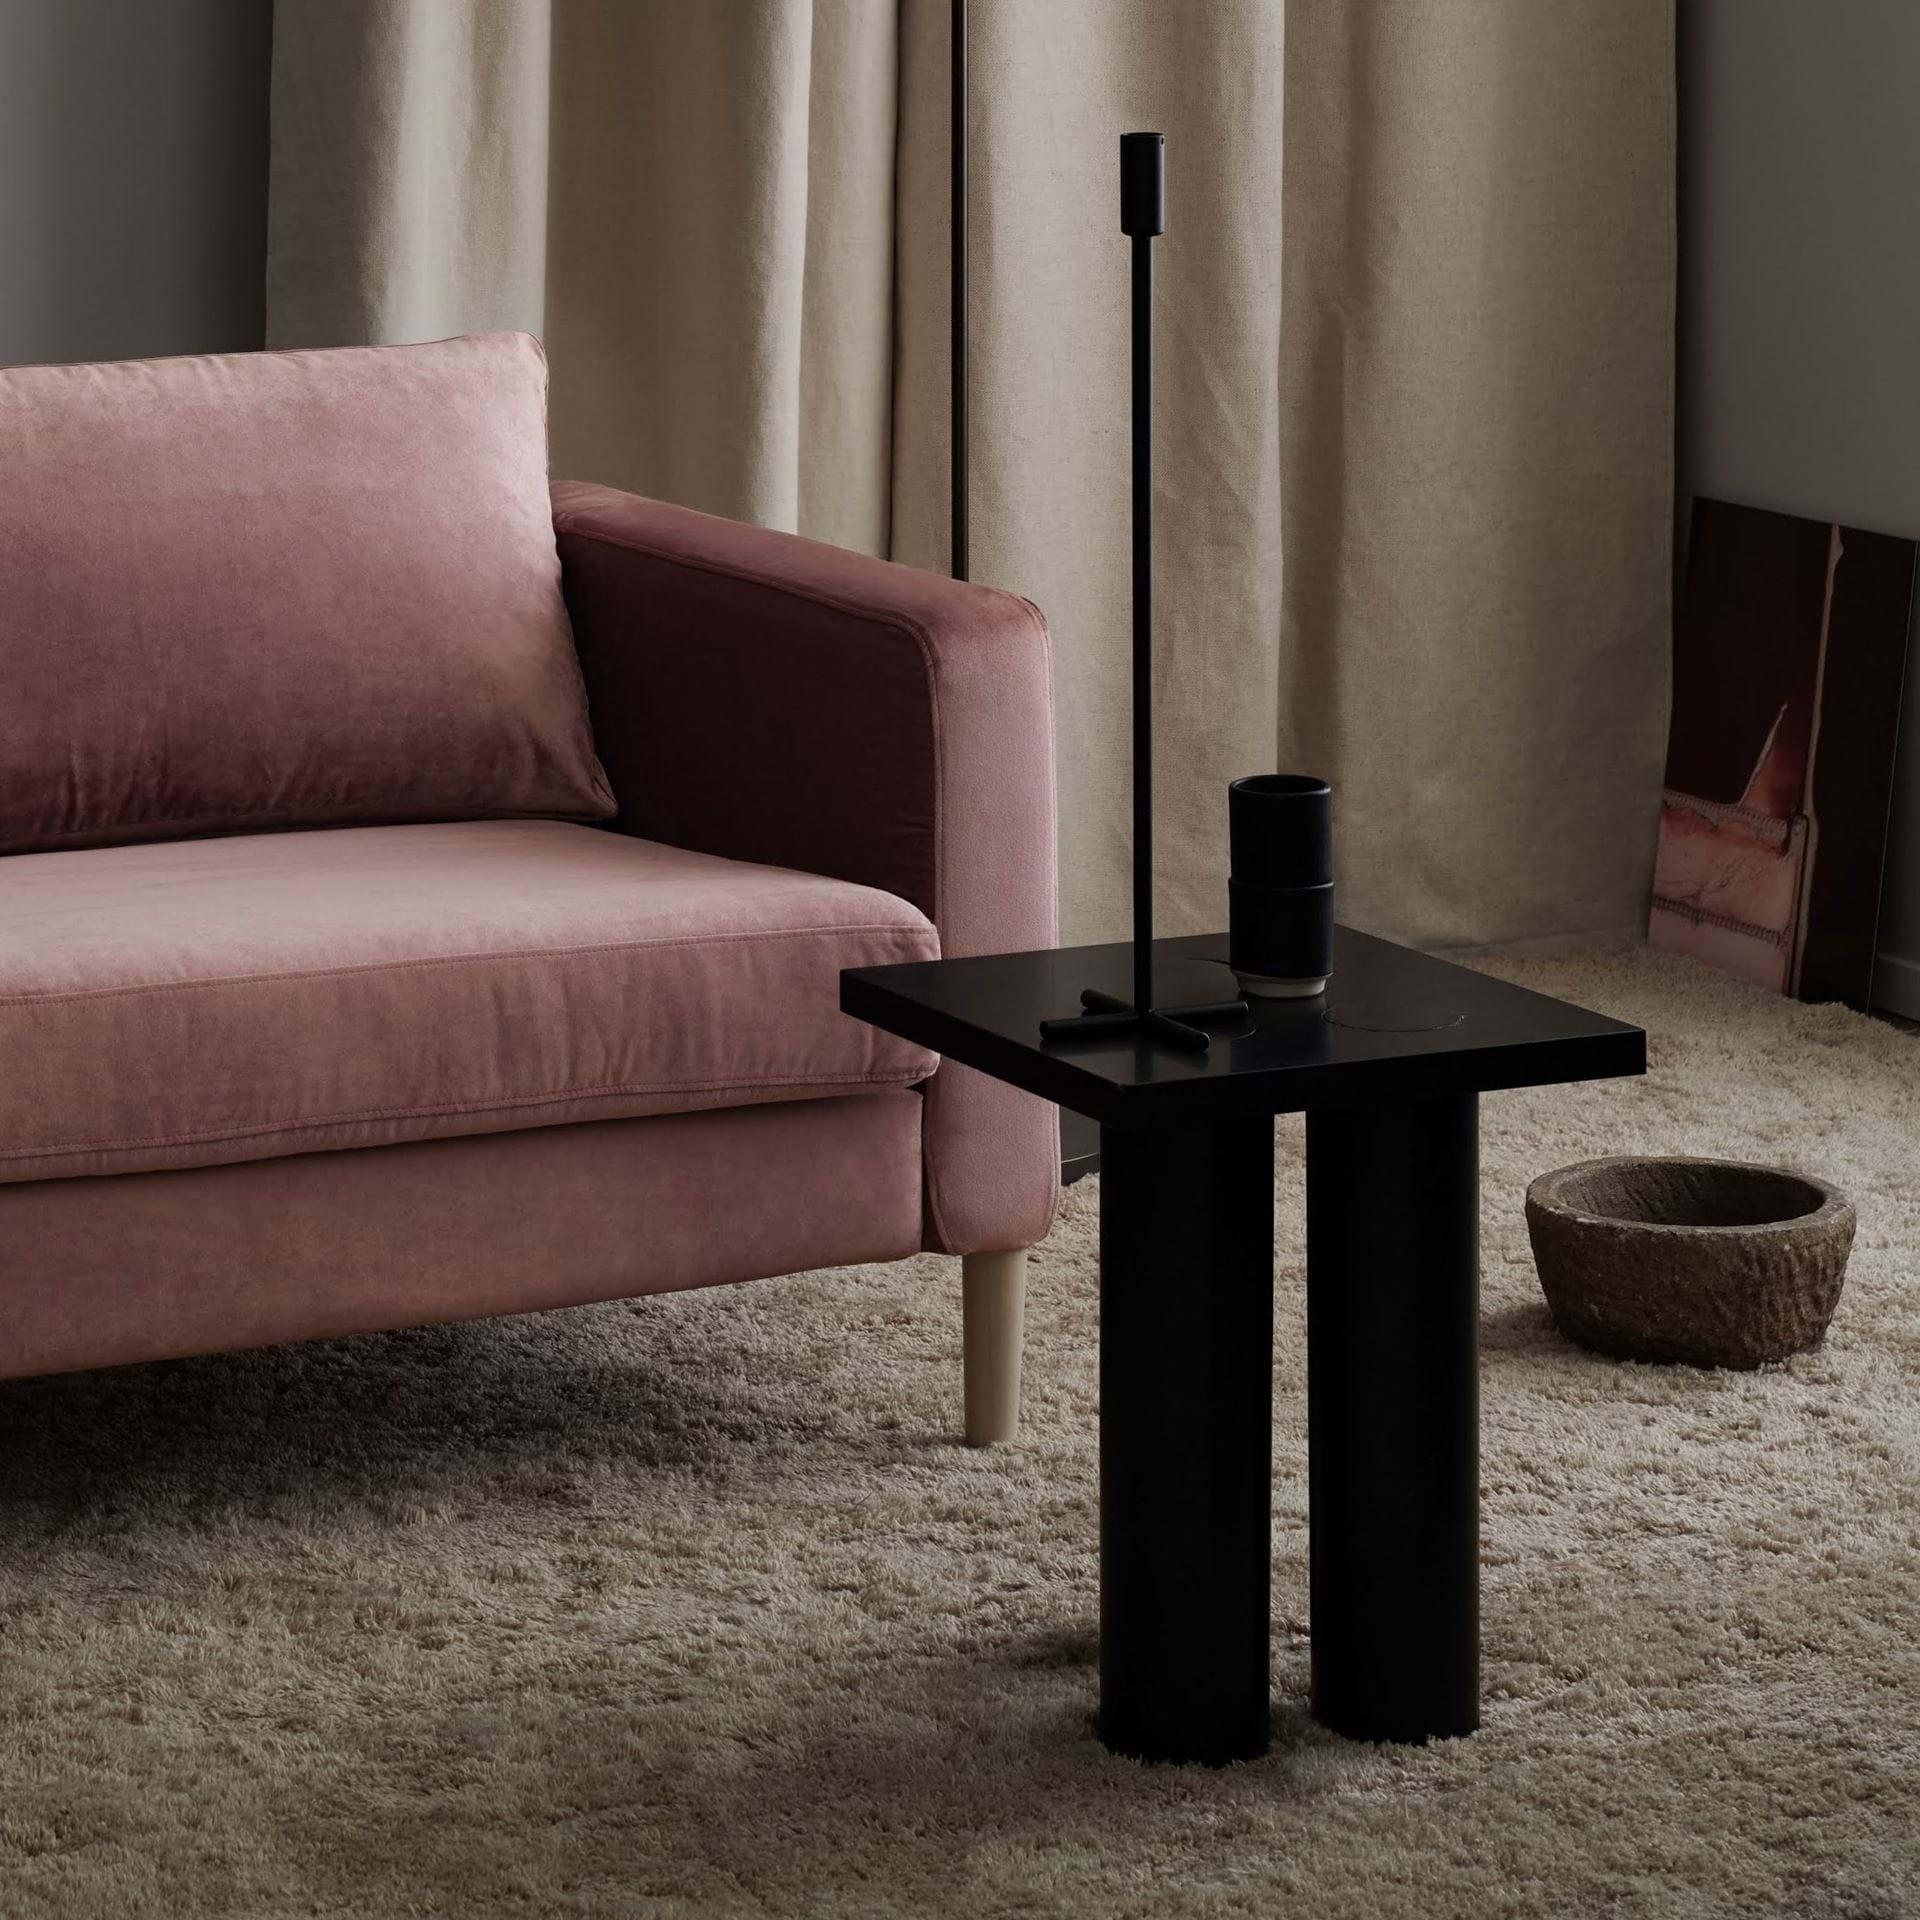 Gambe Per Mobili Ikea kastelle gamba affusolata in legno per mobili | bemz